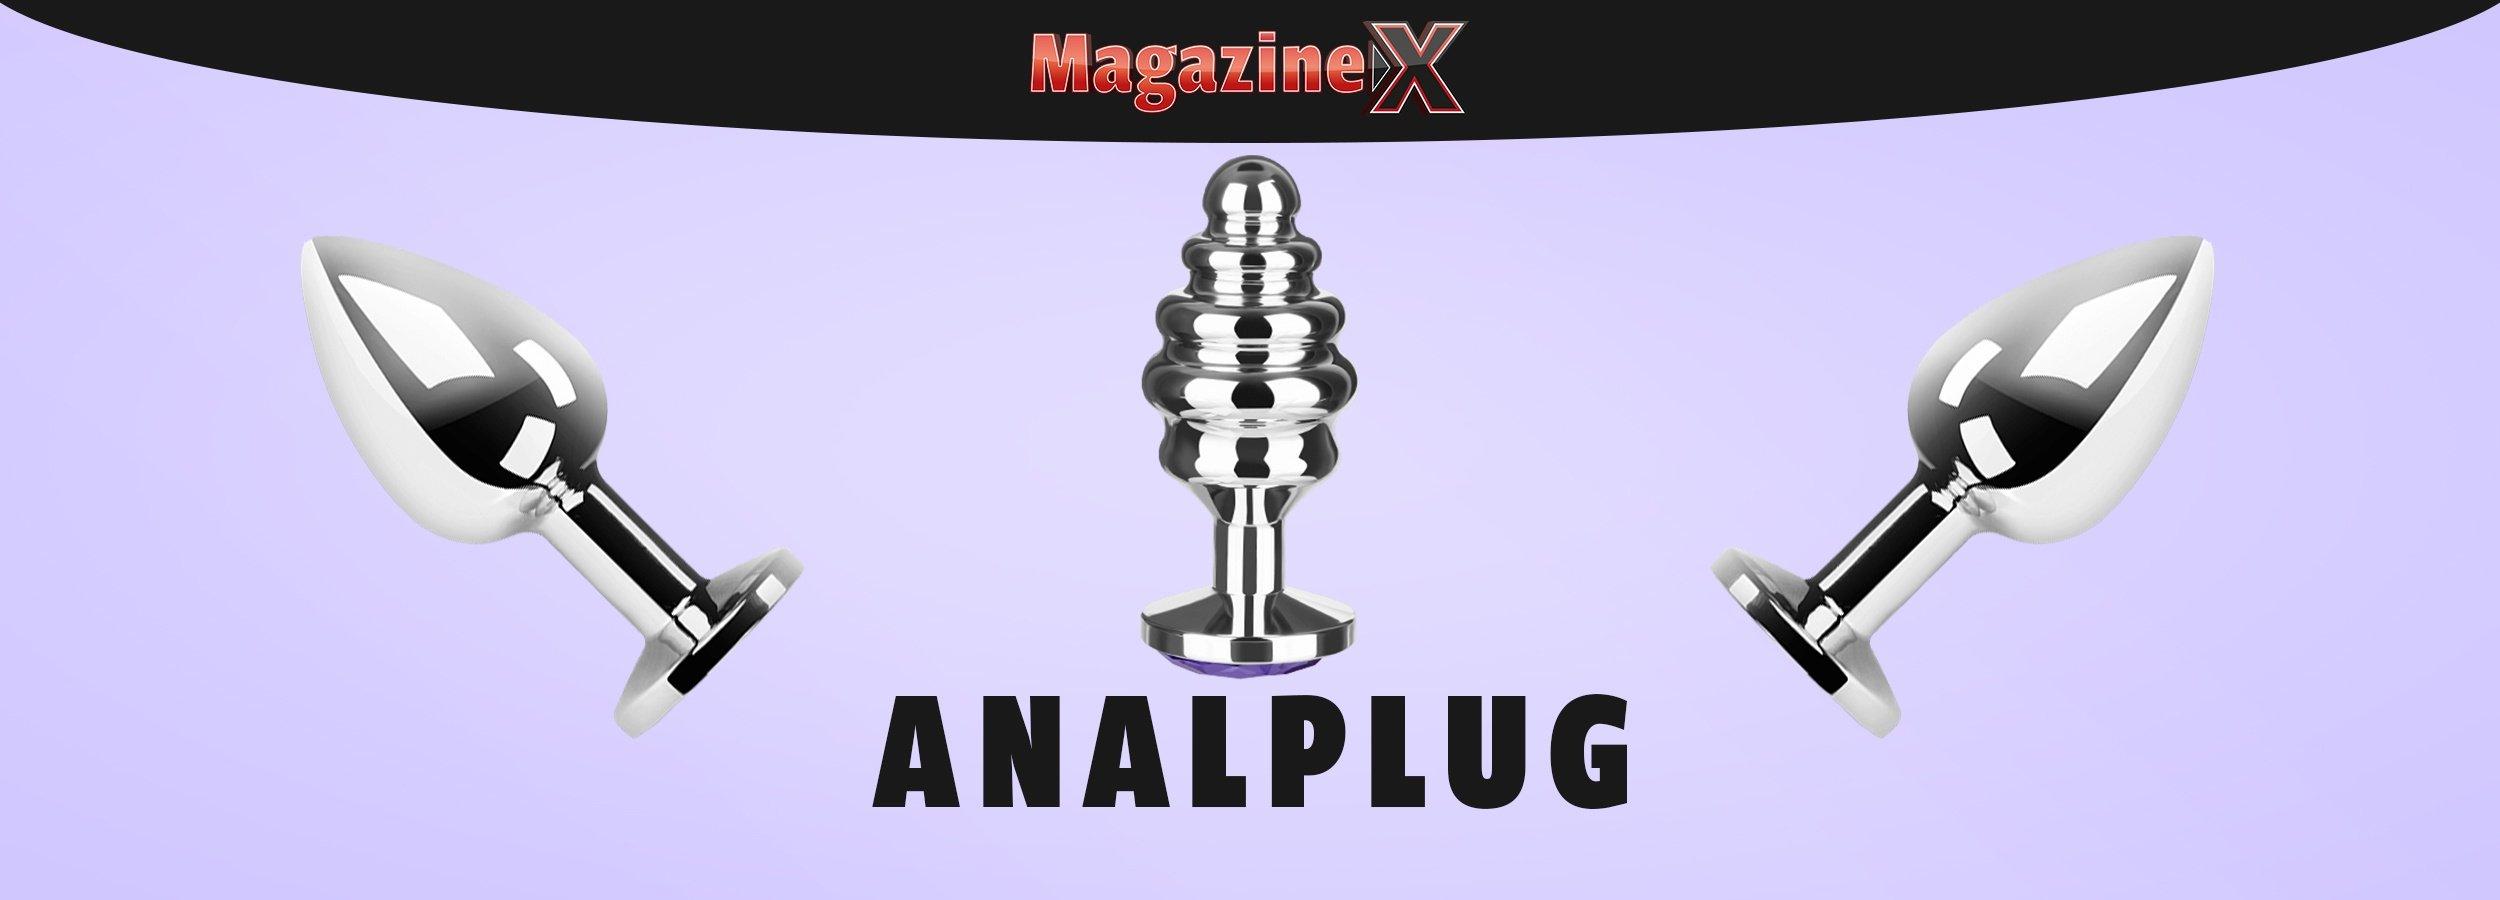 Lange tragen analplug Anal plug